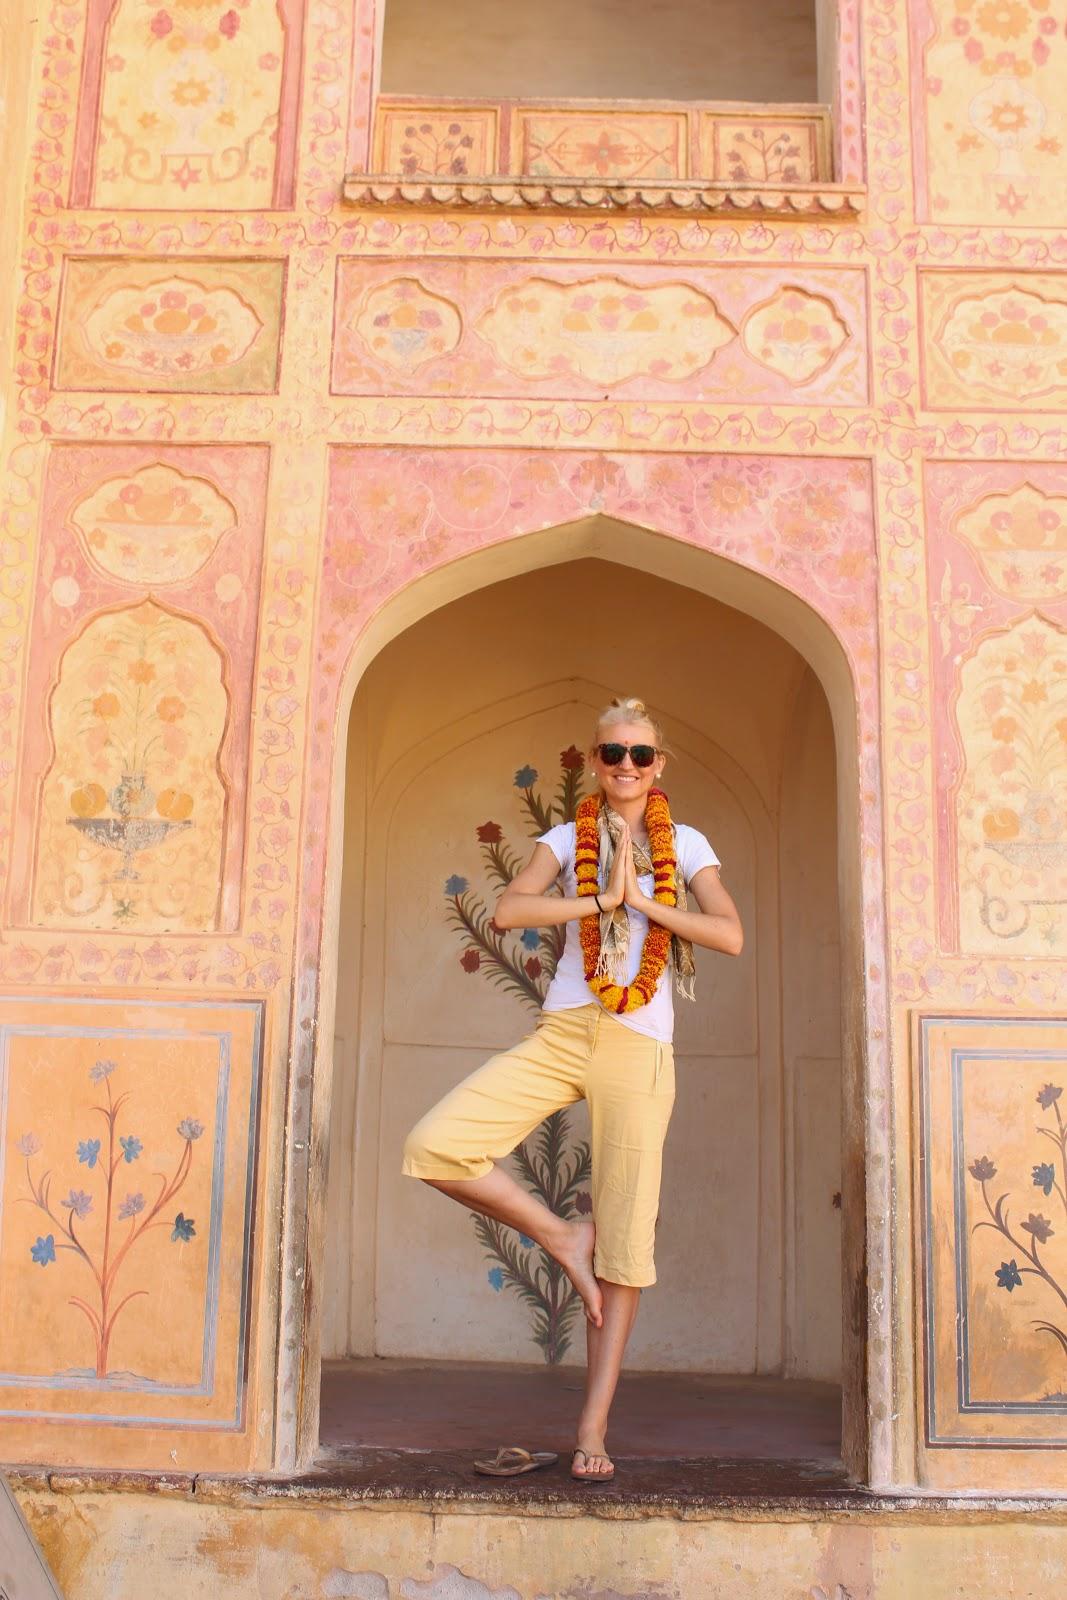 jaipur: india's pink city